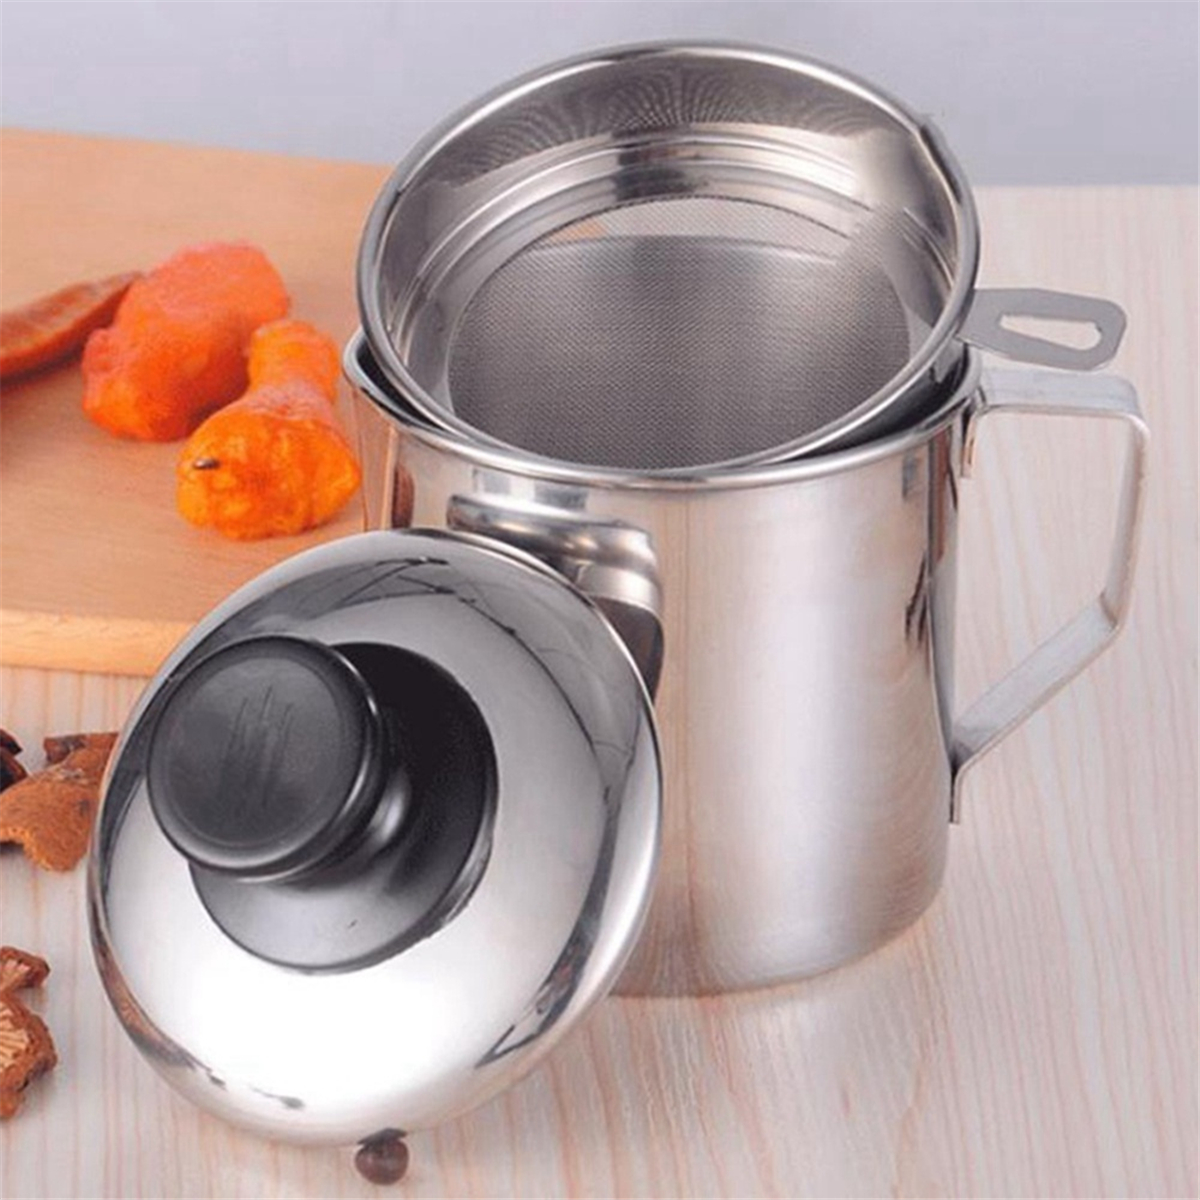 DEIE B4-053-YW Oiler Stainless Steel Oil Filter Separator Pot Kitchen Food Supplies Liquid